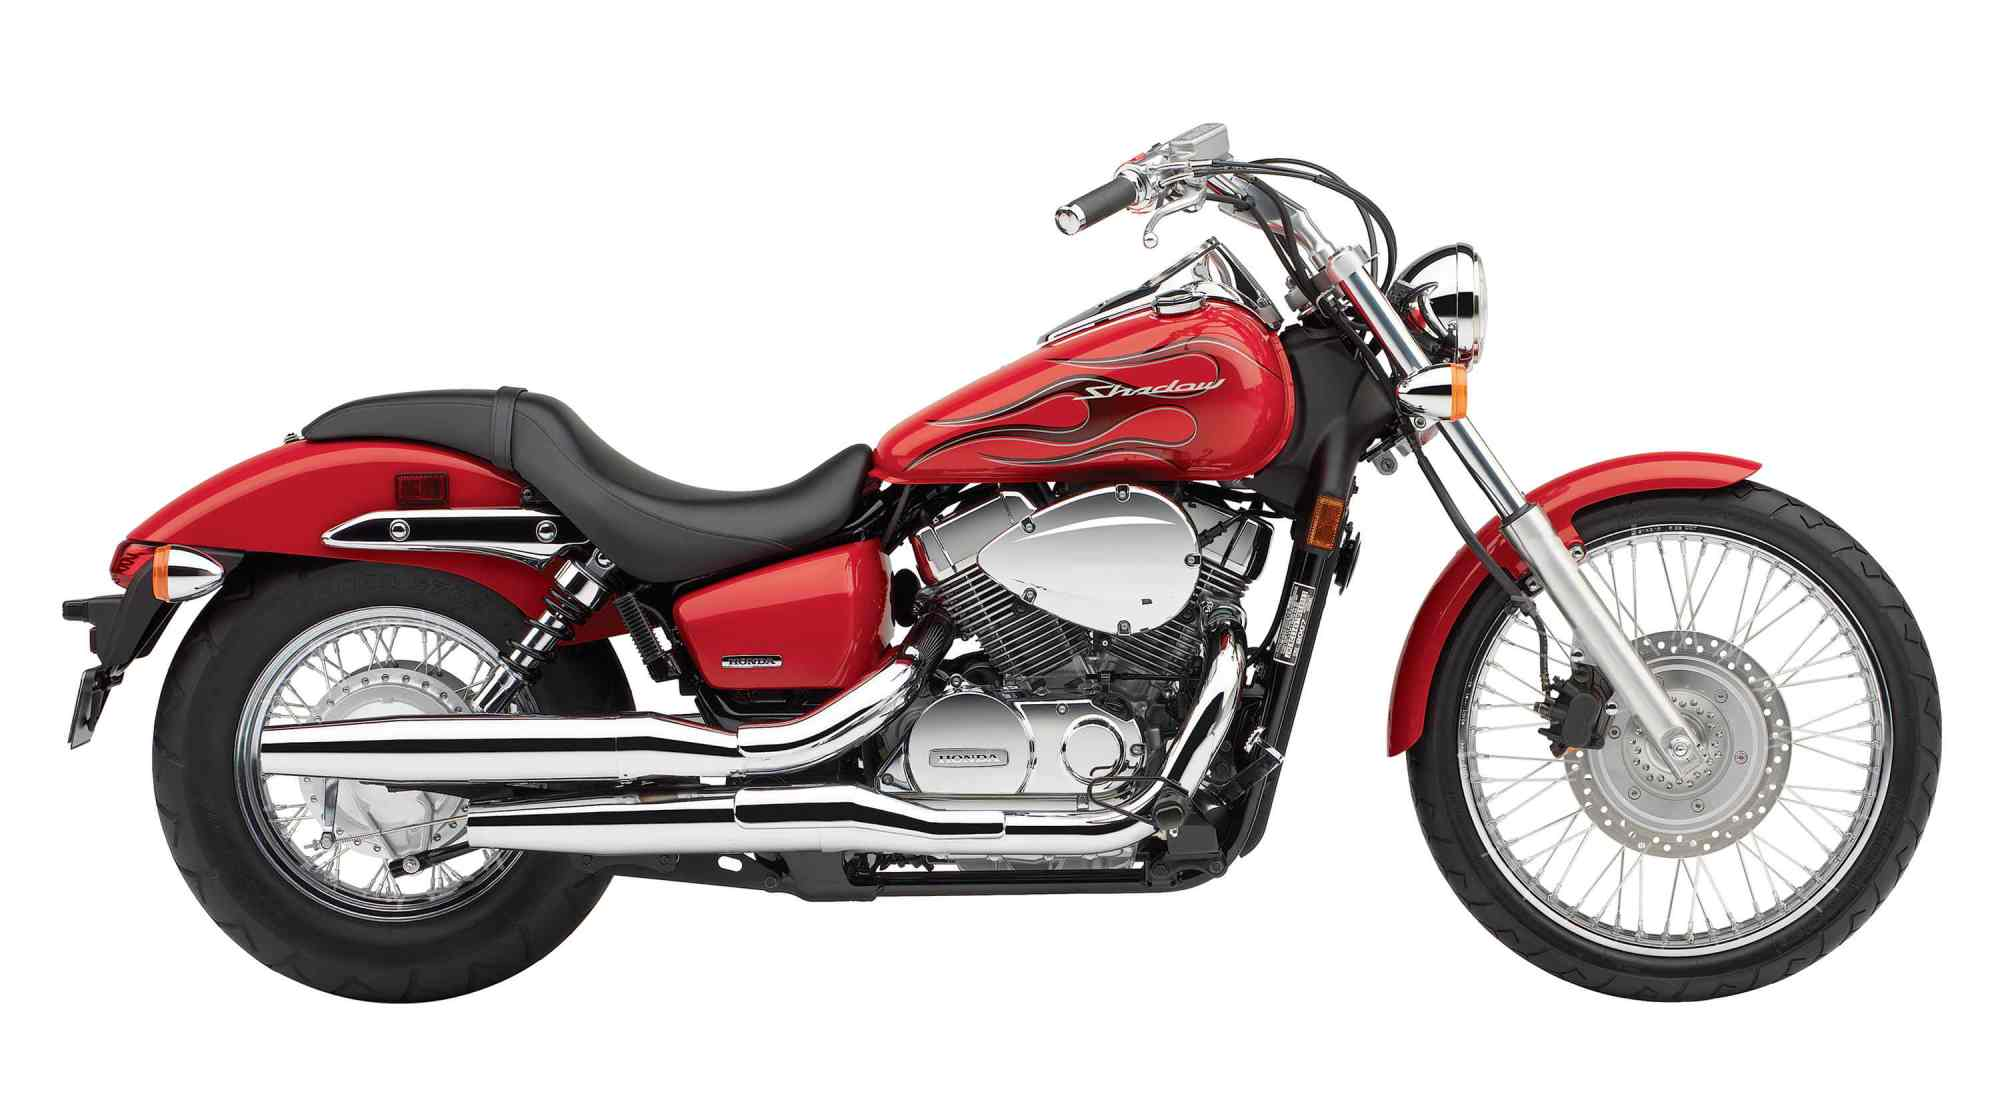 hight resolution of 2007 honda shadow spirit 750 c2